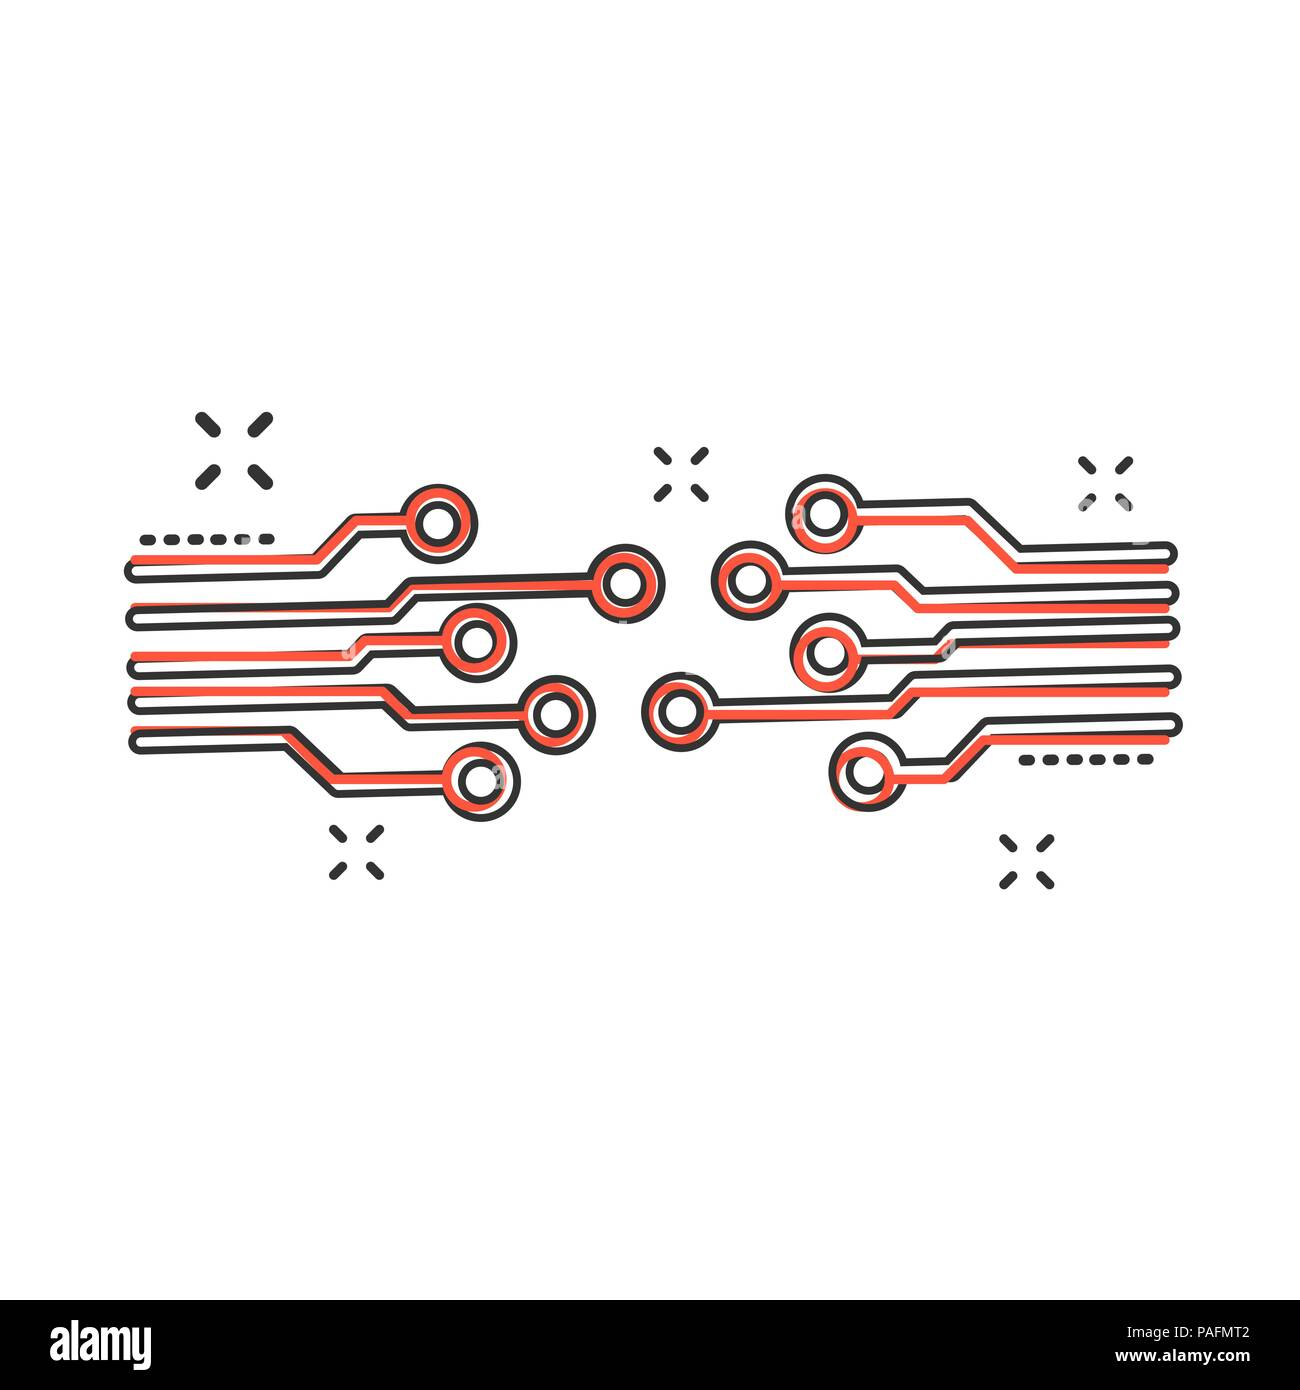 Technological scheme: basic concepts